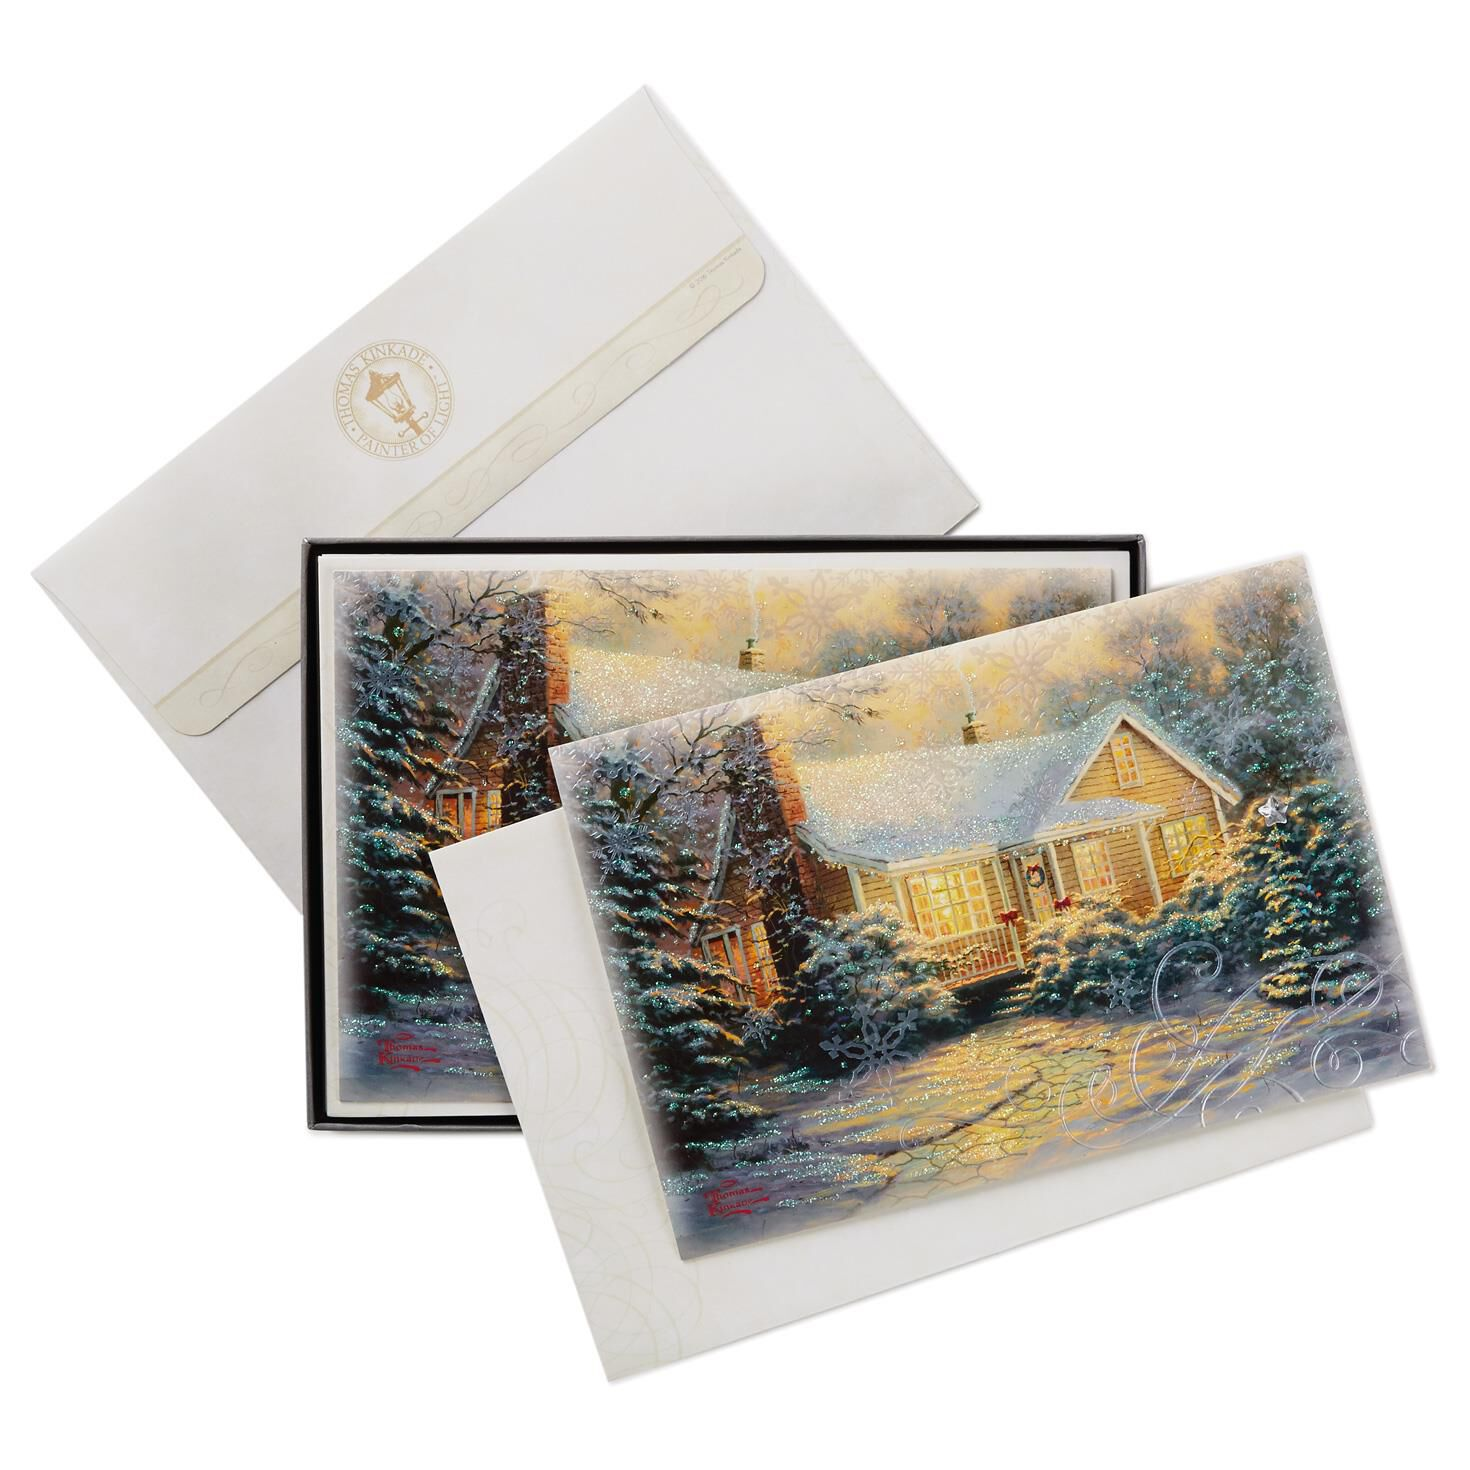 Kinkade christmas cottage - Thomas Kinkade Christmas Cottage Christmas Cards Box Of 12 Boxed Cards Hallmark